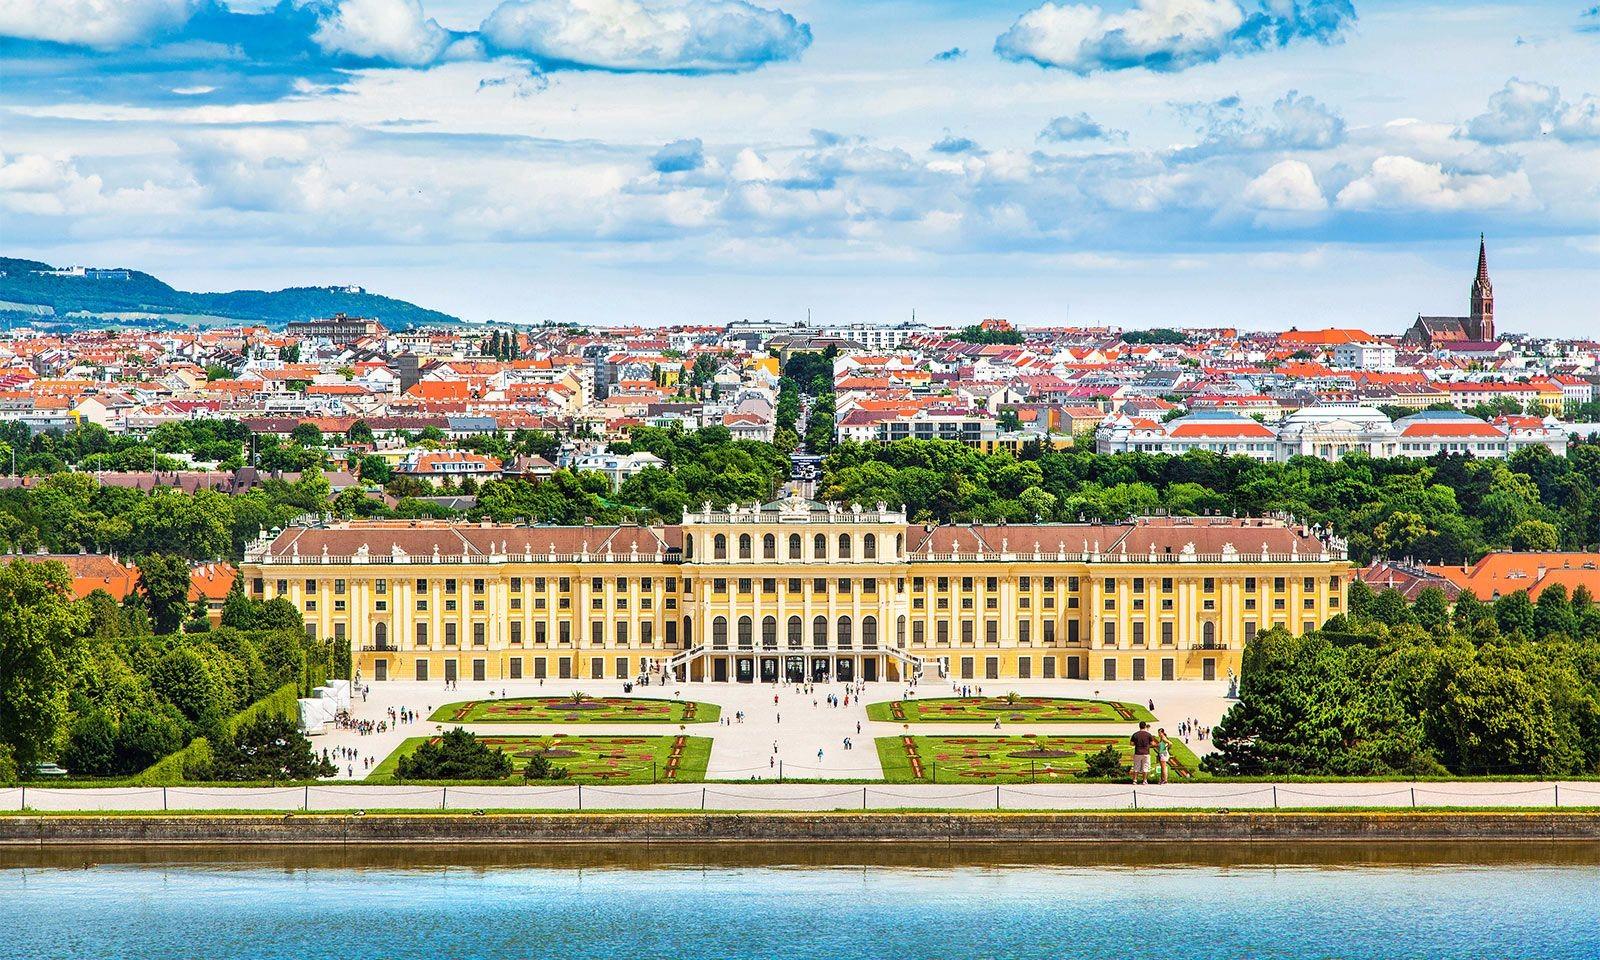 VIENNA. The best place to go for Erasmus.